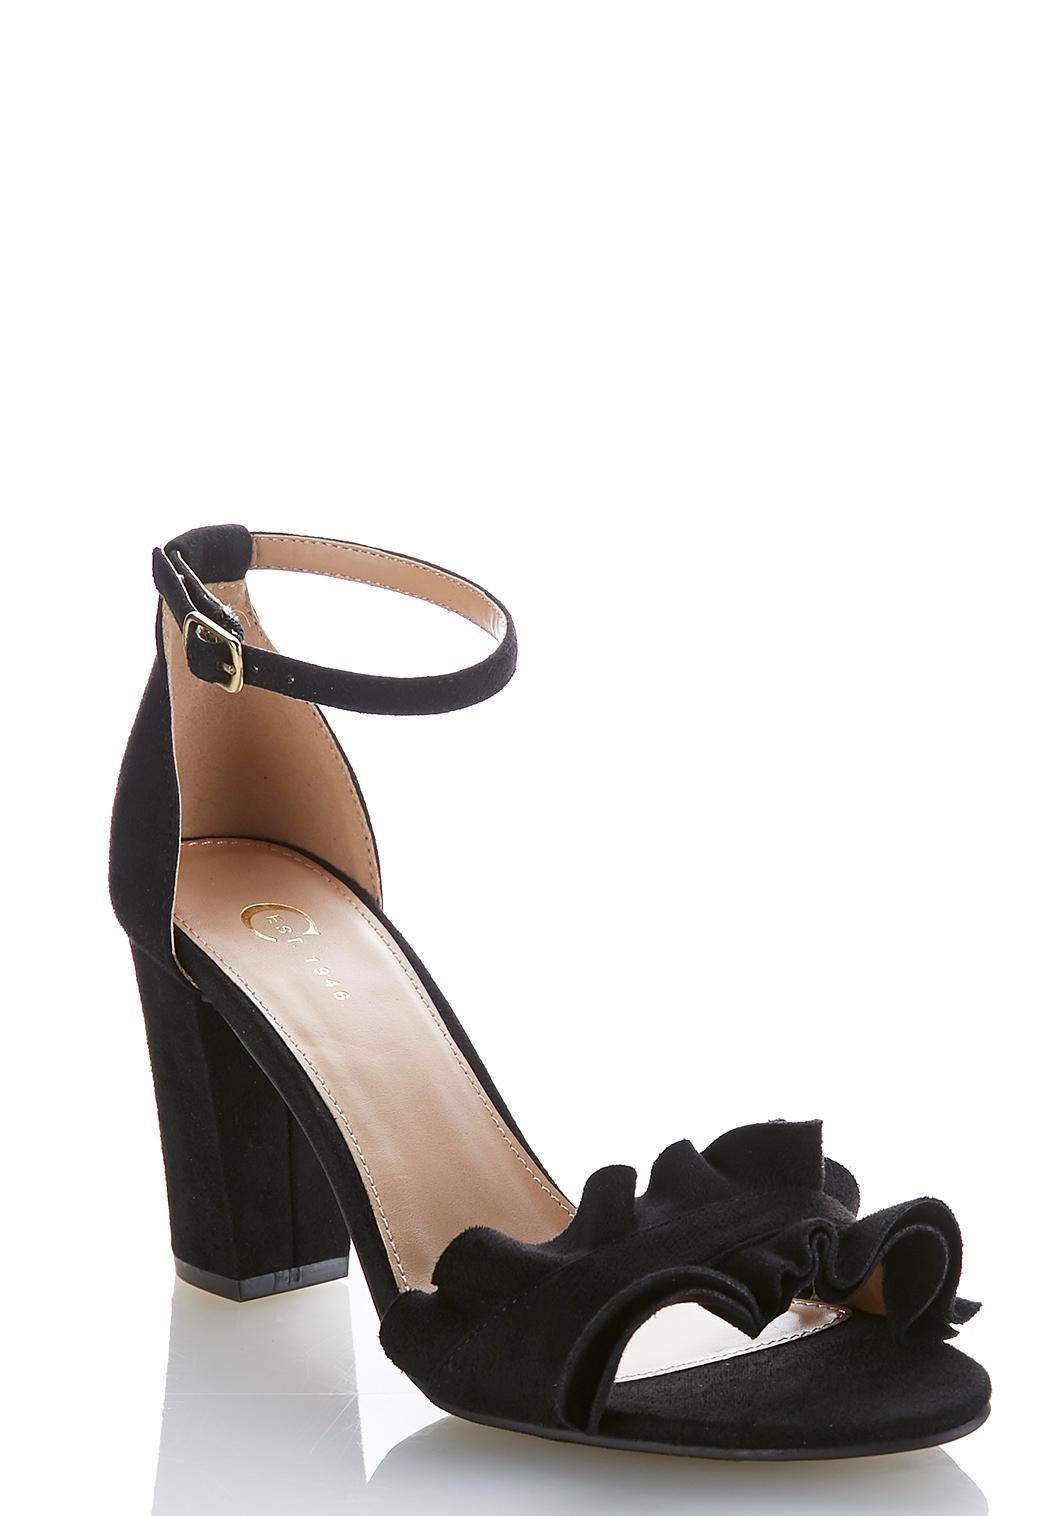 3d5ffd2b154 Ruffled Vamp Heeled Sandals  CatoConfident  CatoFashions